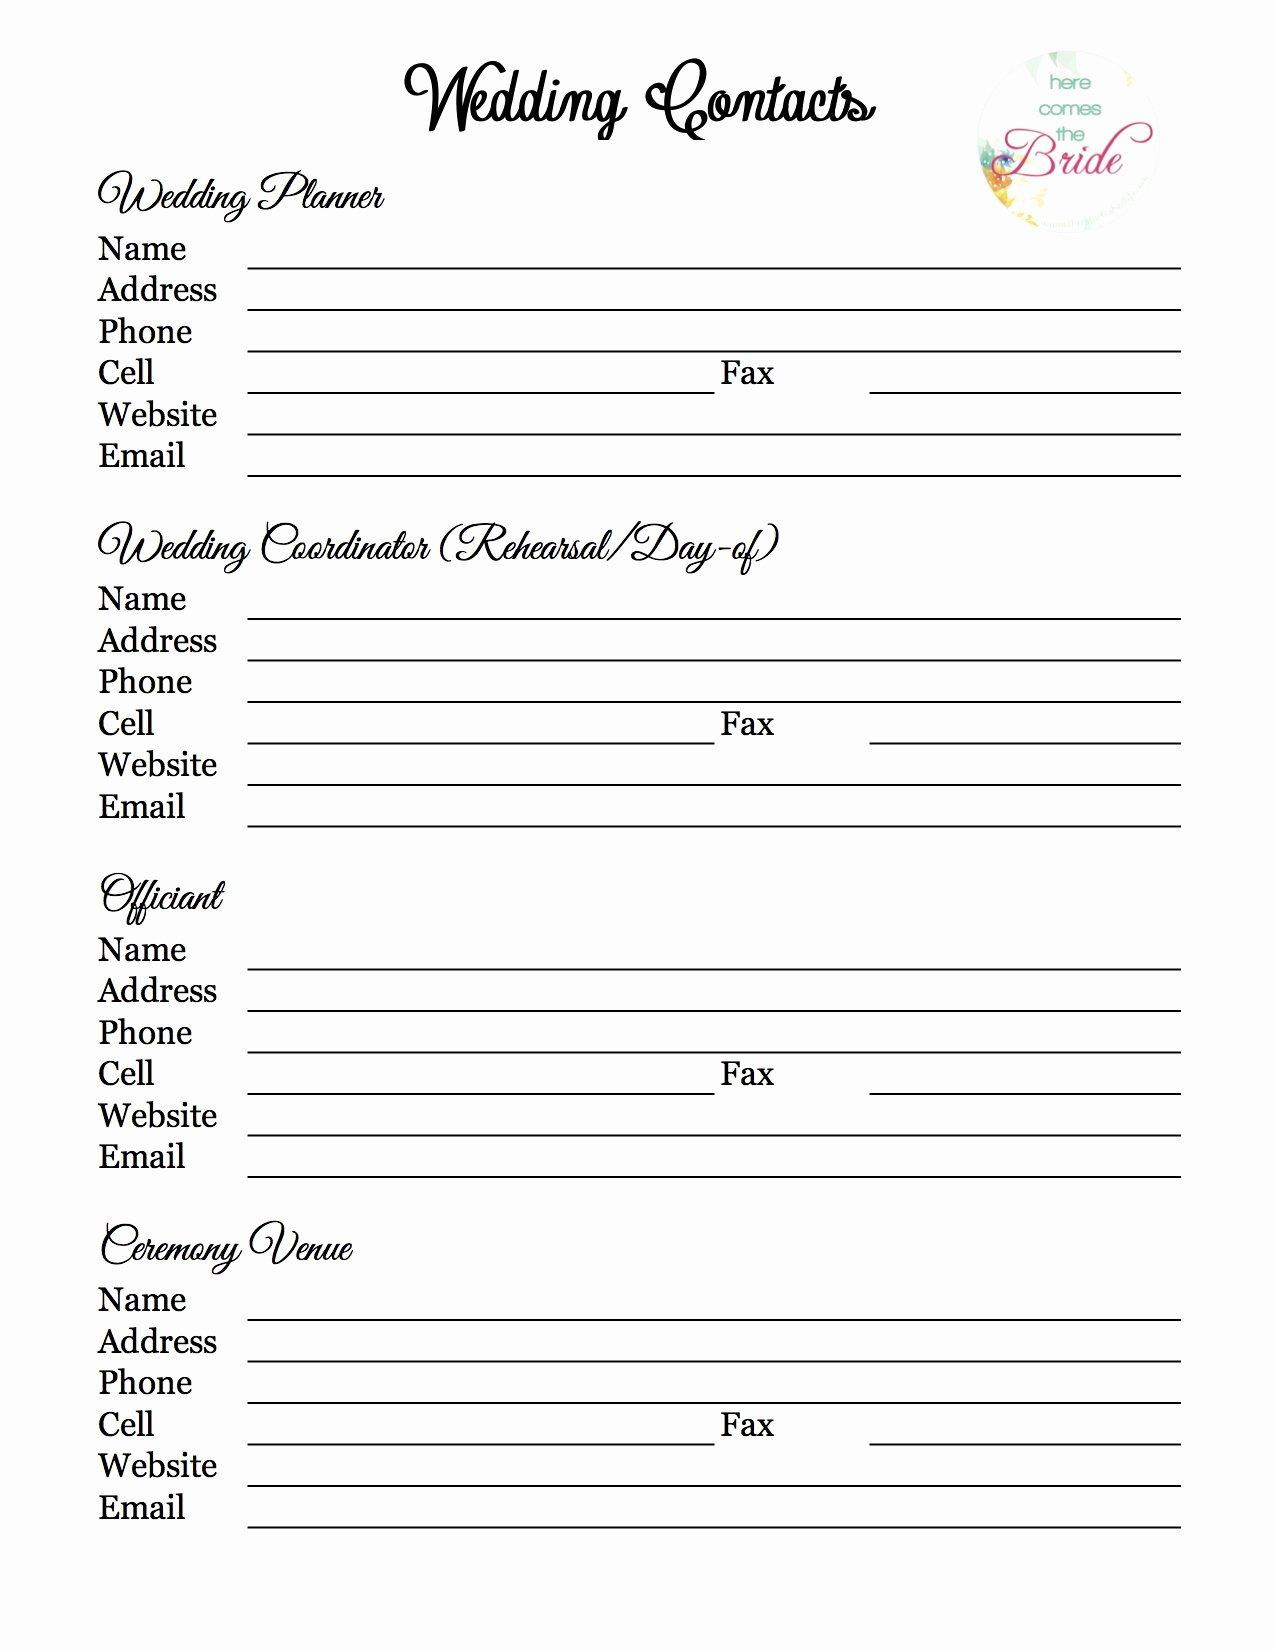 Wedding Vendors List Template Beautiful Wedding Planner with Free Printables – Refurbished